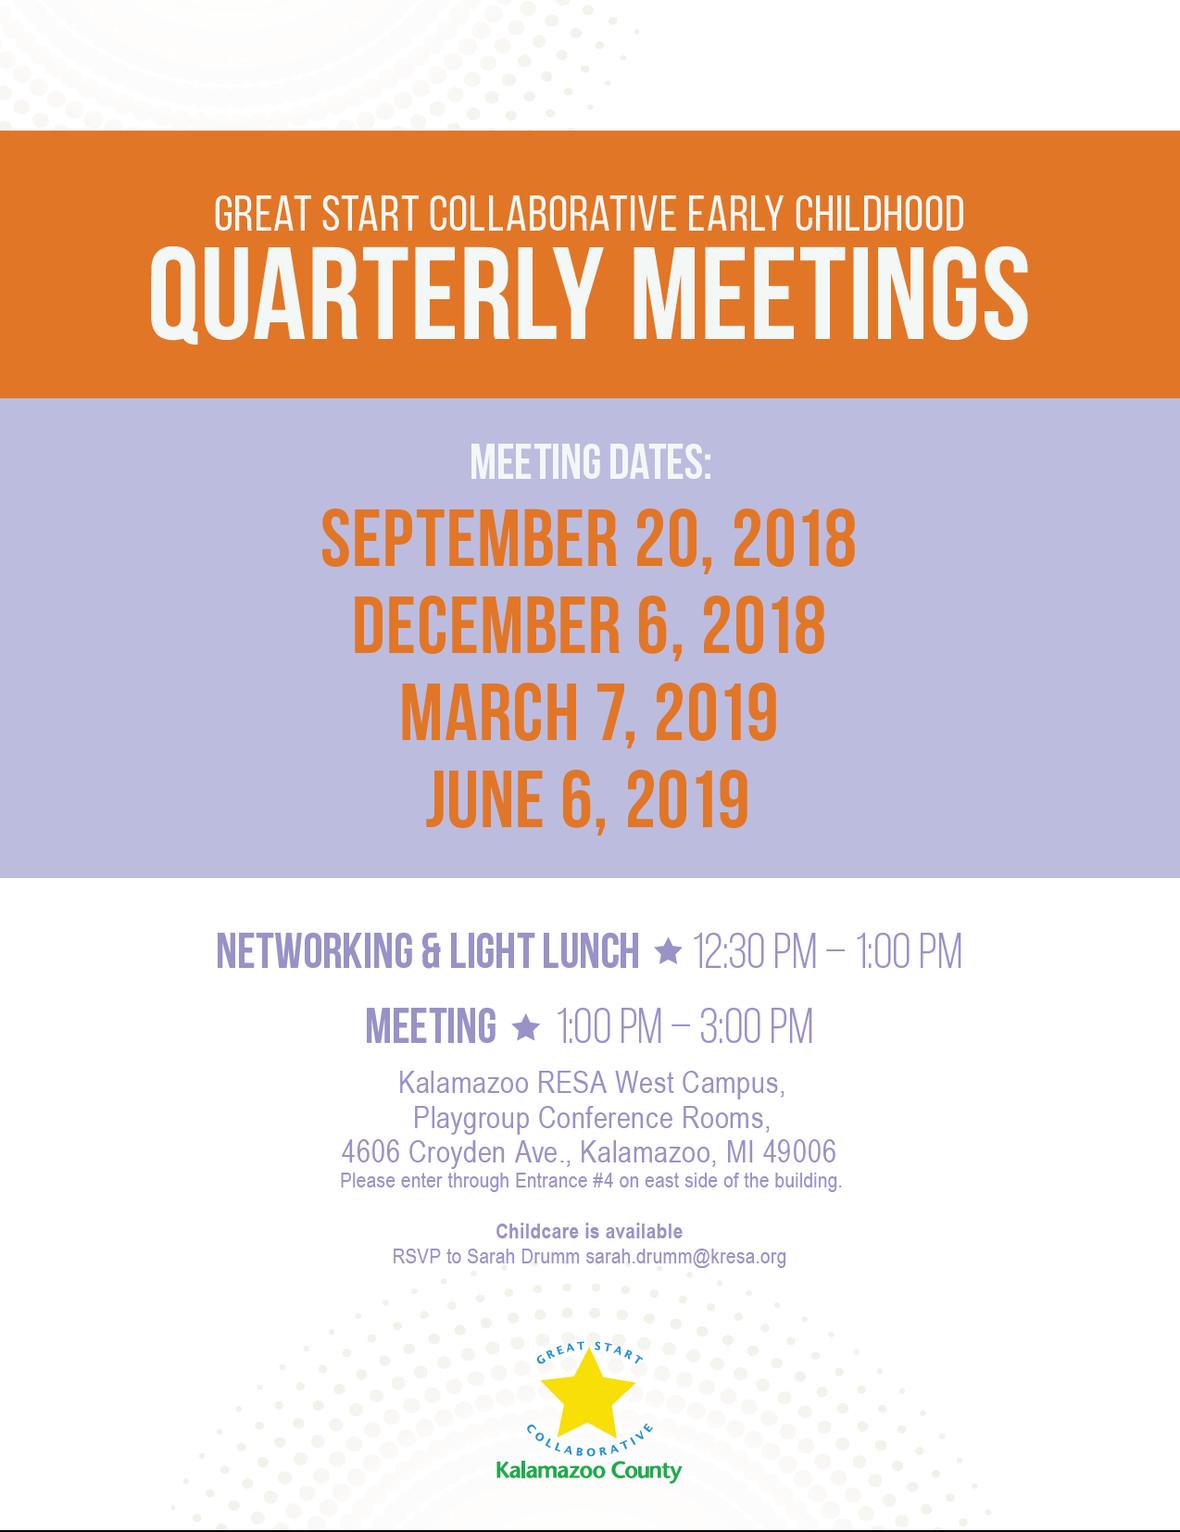 2018.2019 quarterly meeting dates